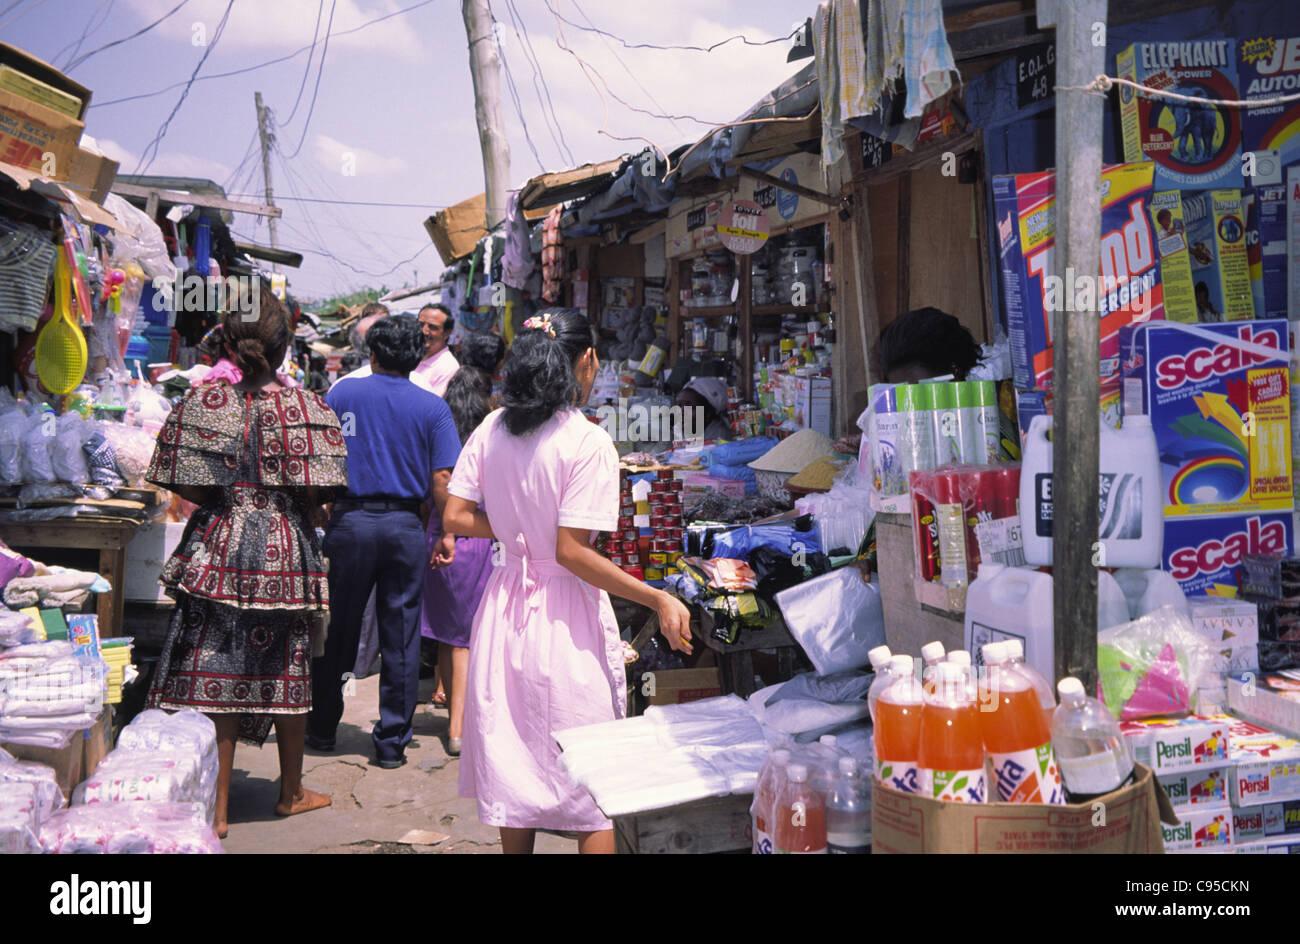 Lagos Market, Nigeria. - Stock Image